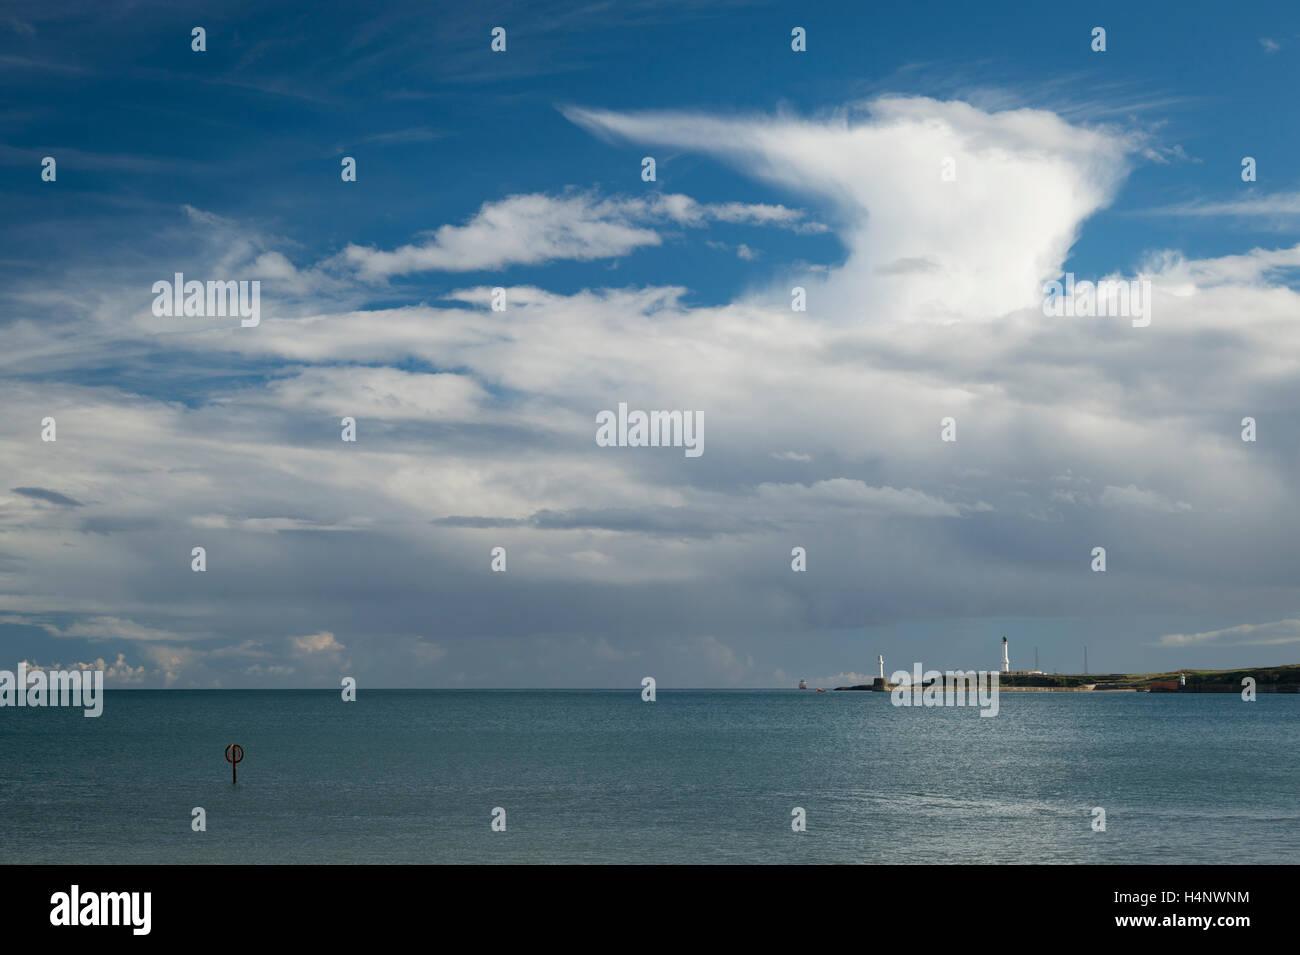 Weather over Torry Battery, Aberdeen, Aberdeenshire, Scotland. - Stock Image